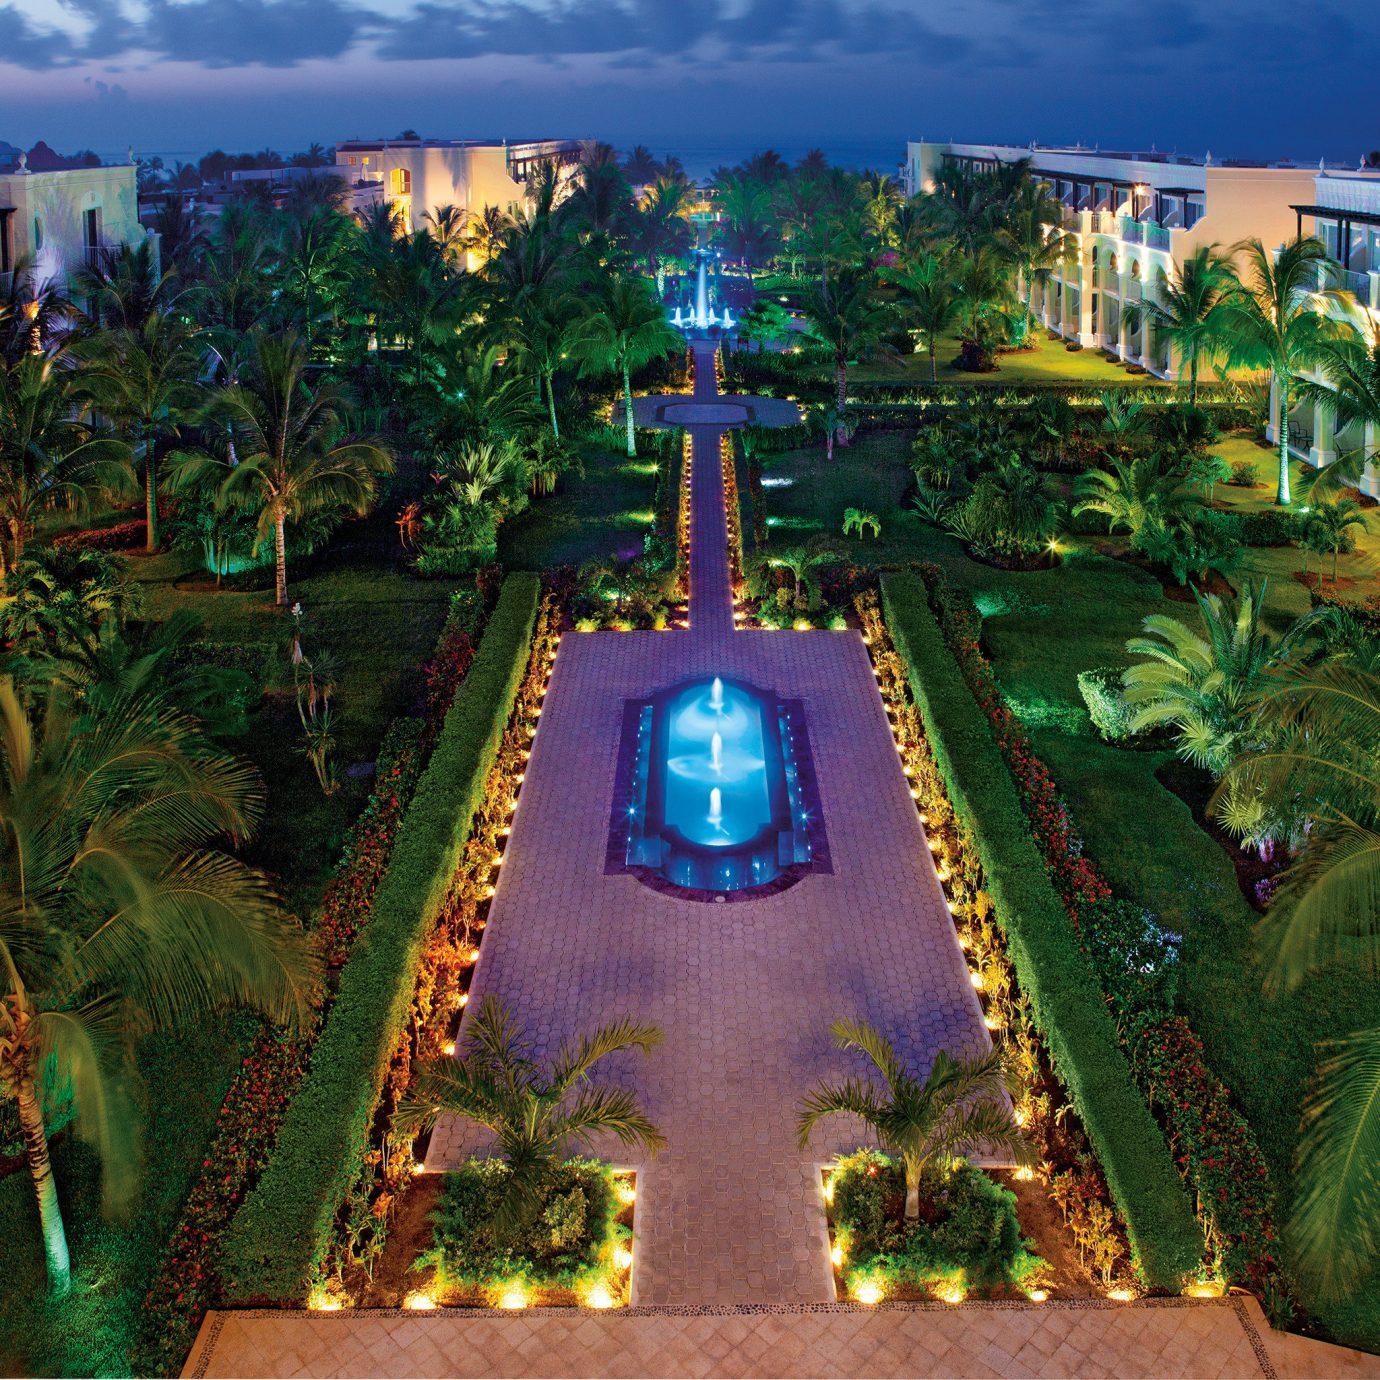 Architecture Buildings Exterior Pool Tropical Resort amusement park Jungle park screenshot Water park Garden flower colorful